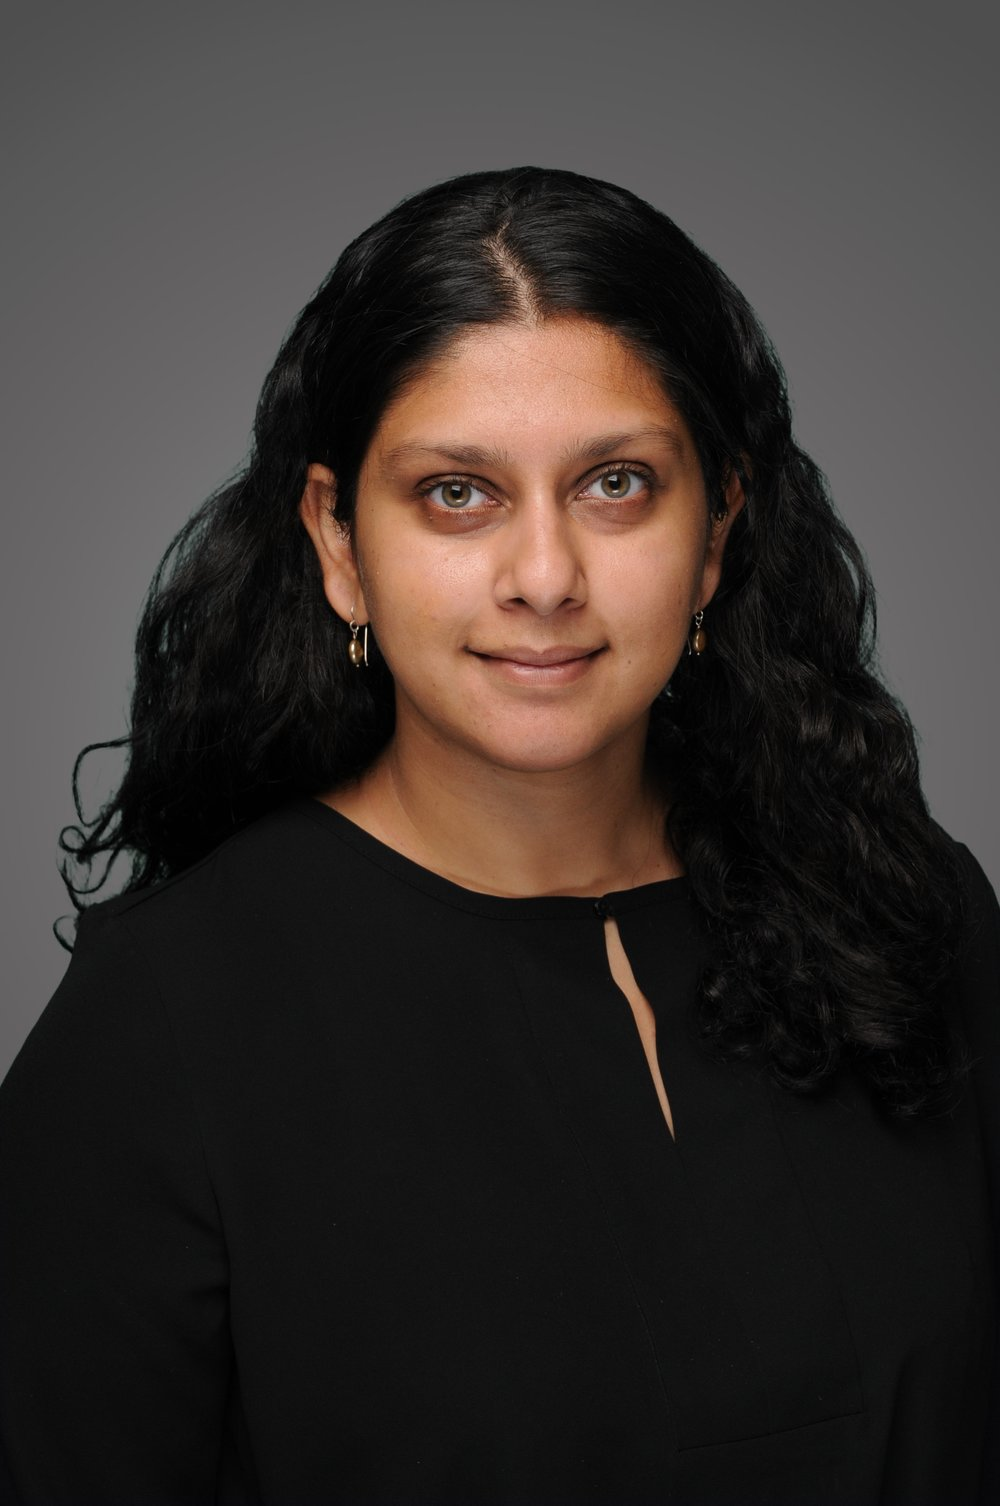 Sanajna Singh   AVP of Marketing  sps511@stern.nyu.edu